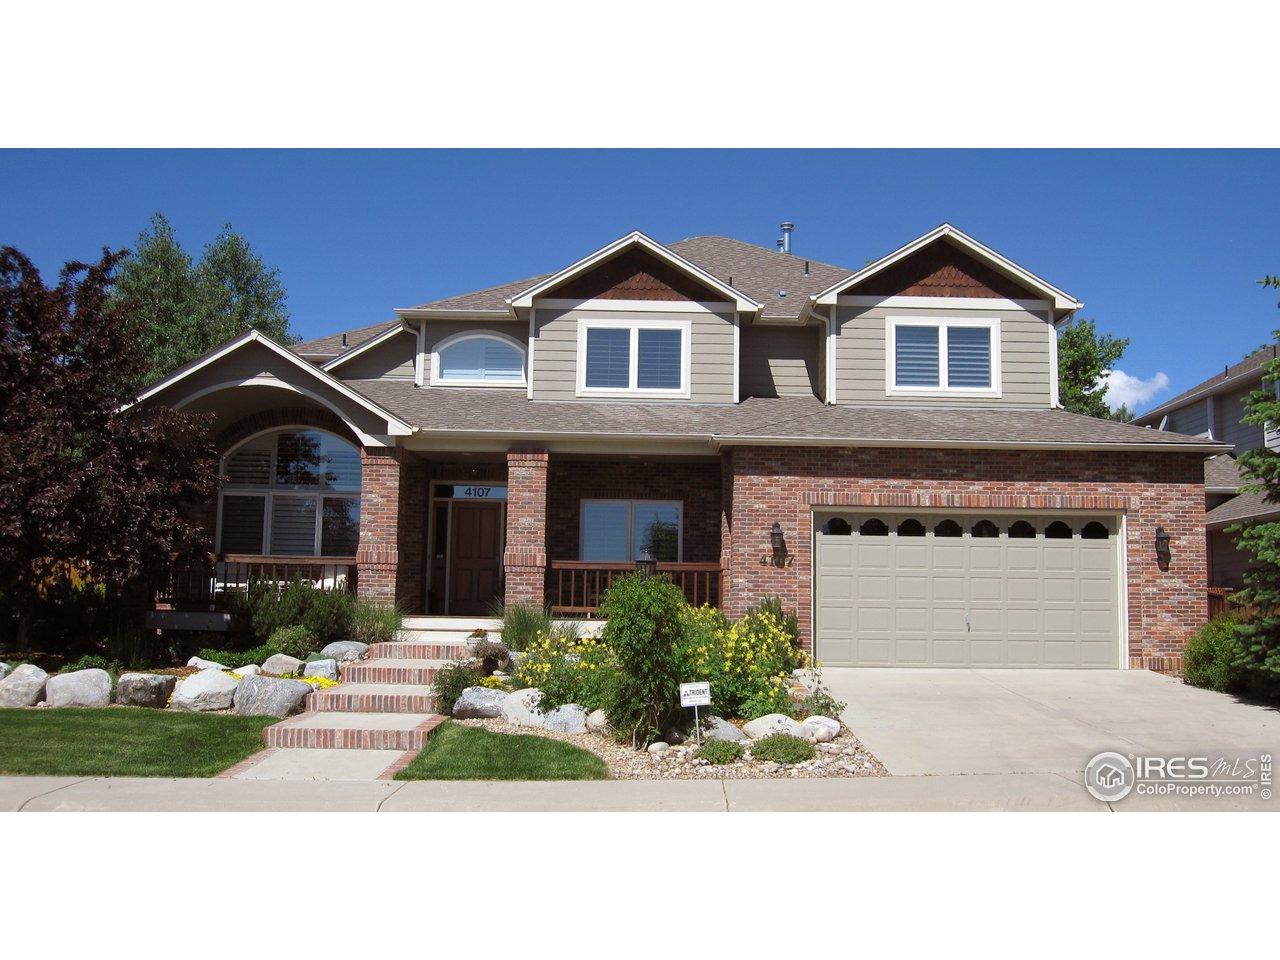 4107 Nevis St, Boulder CO 80301